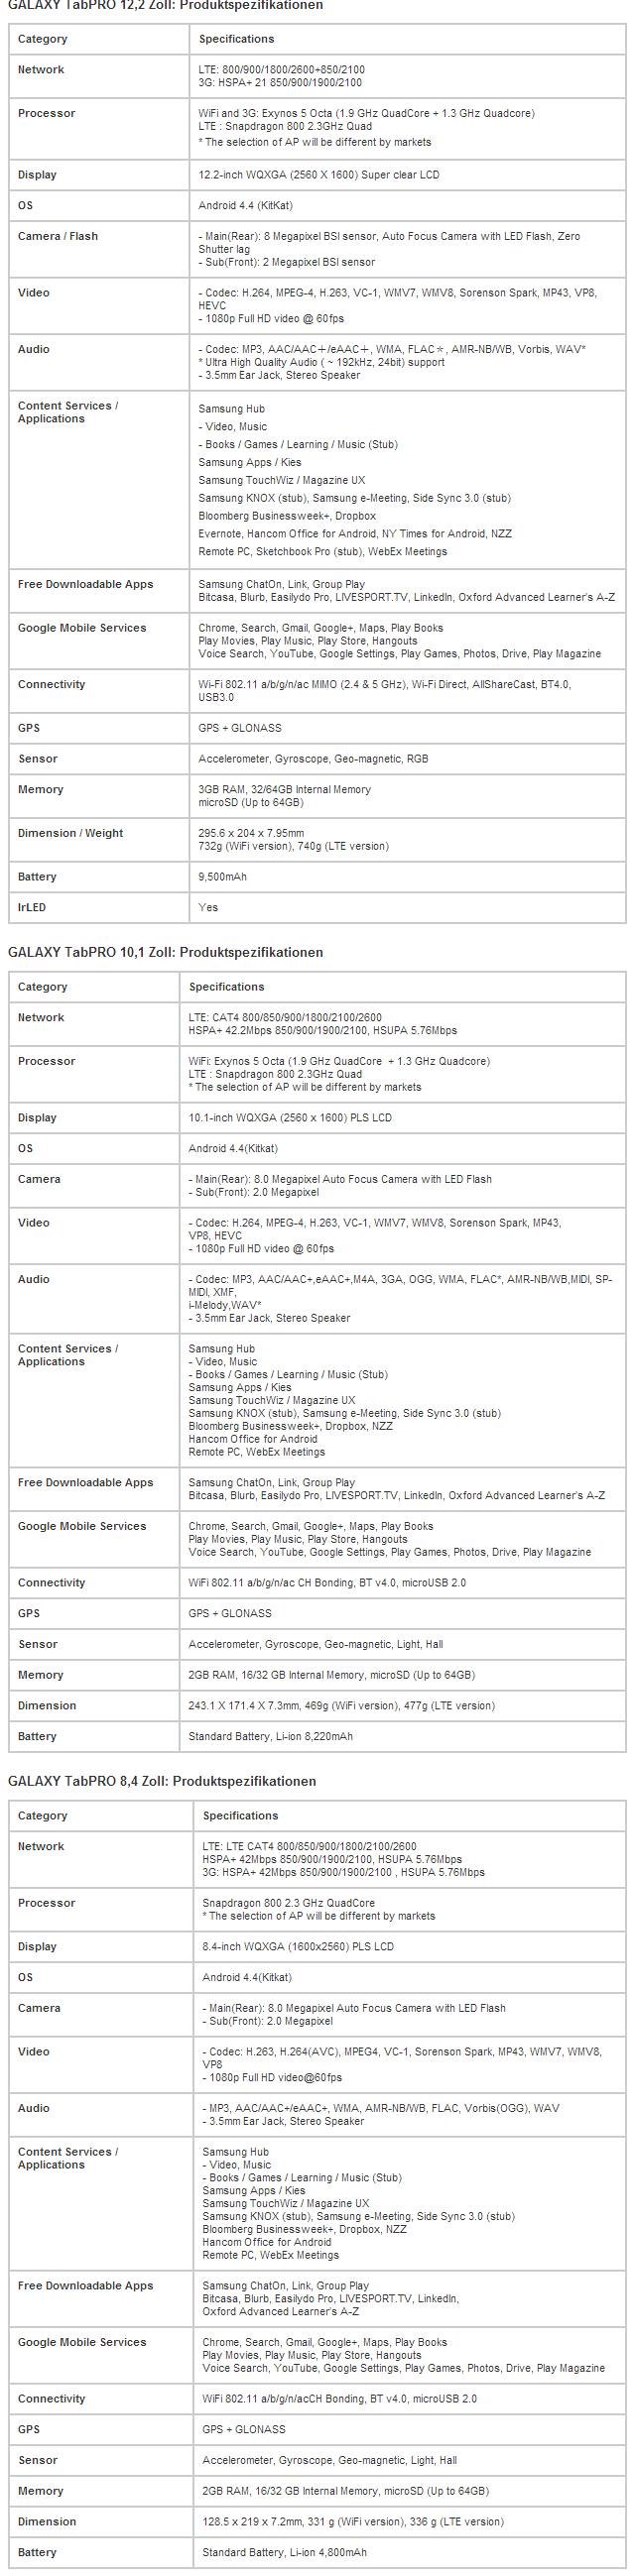 Samsung_Galaxy_Tab_Pro_Series